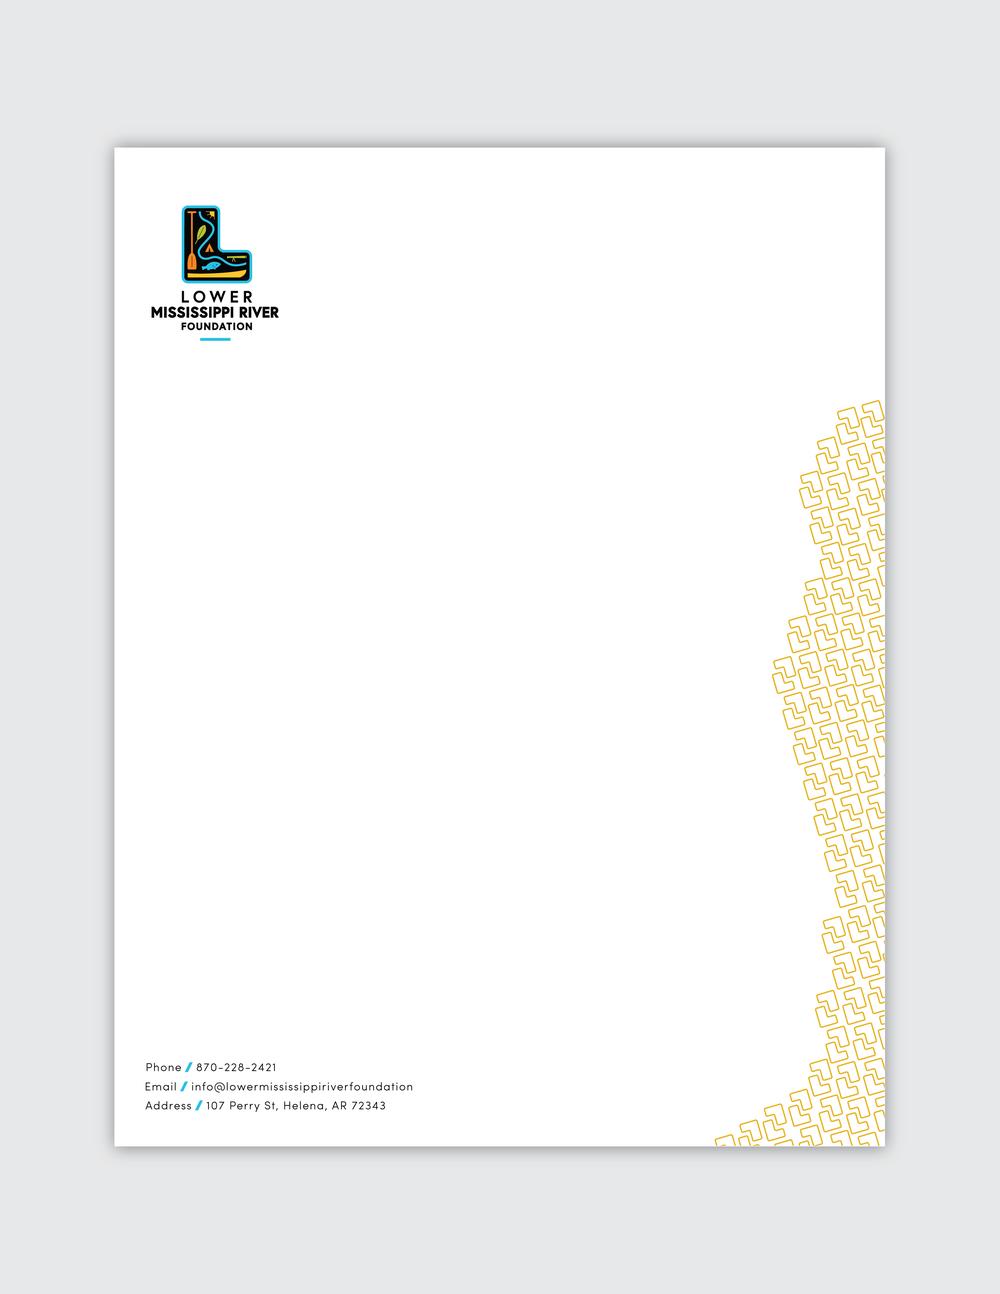 LMRF_letterhead-02.png